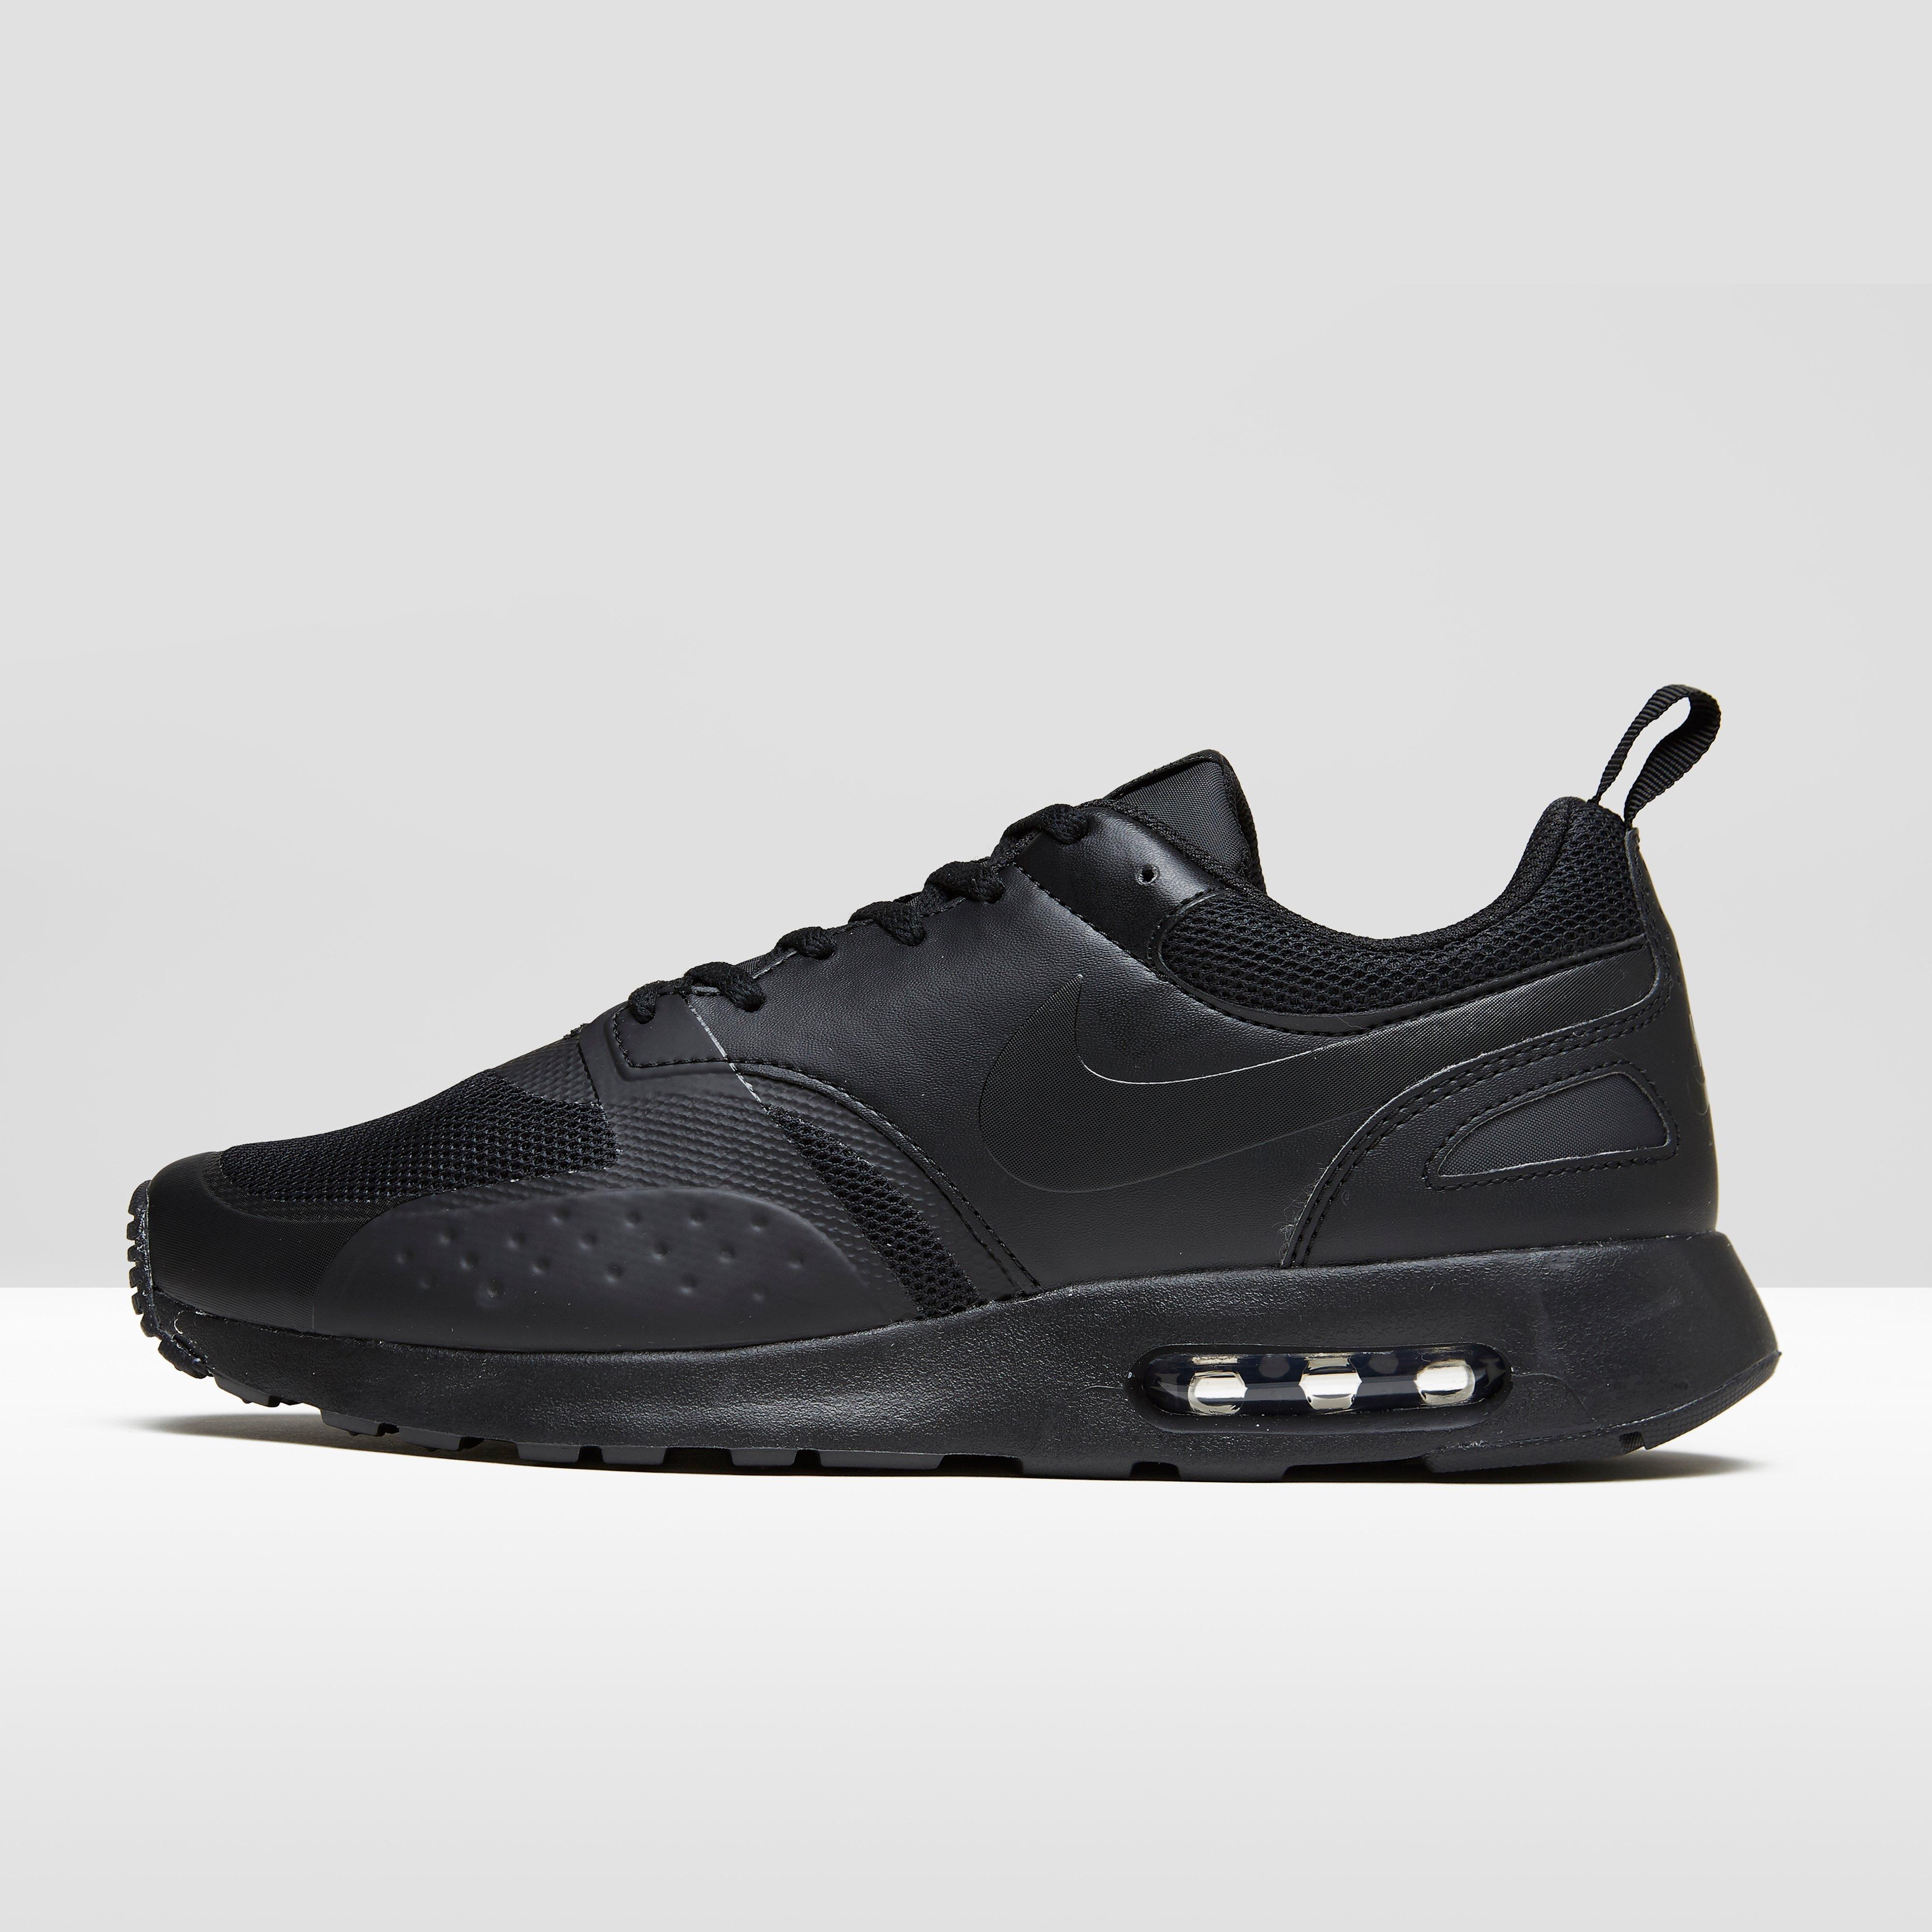 9ad29f7baa Nike Air Max Snakeskin Zwart | MobiHealthNews